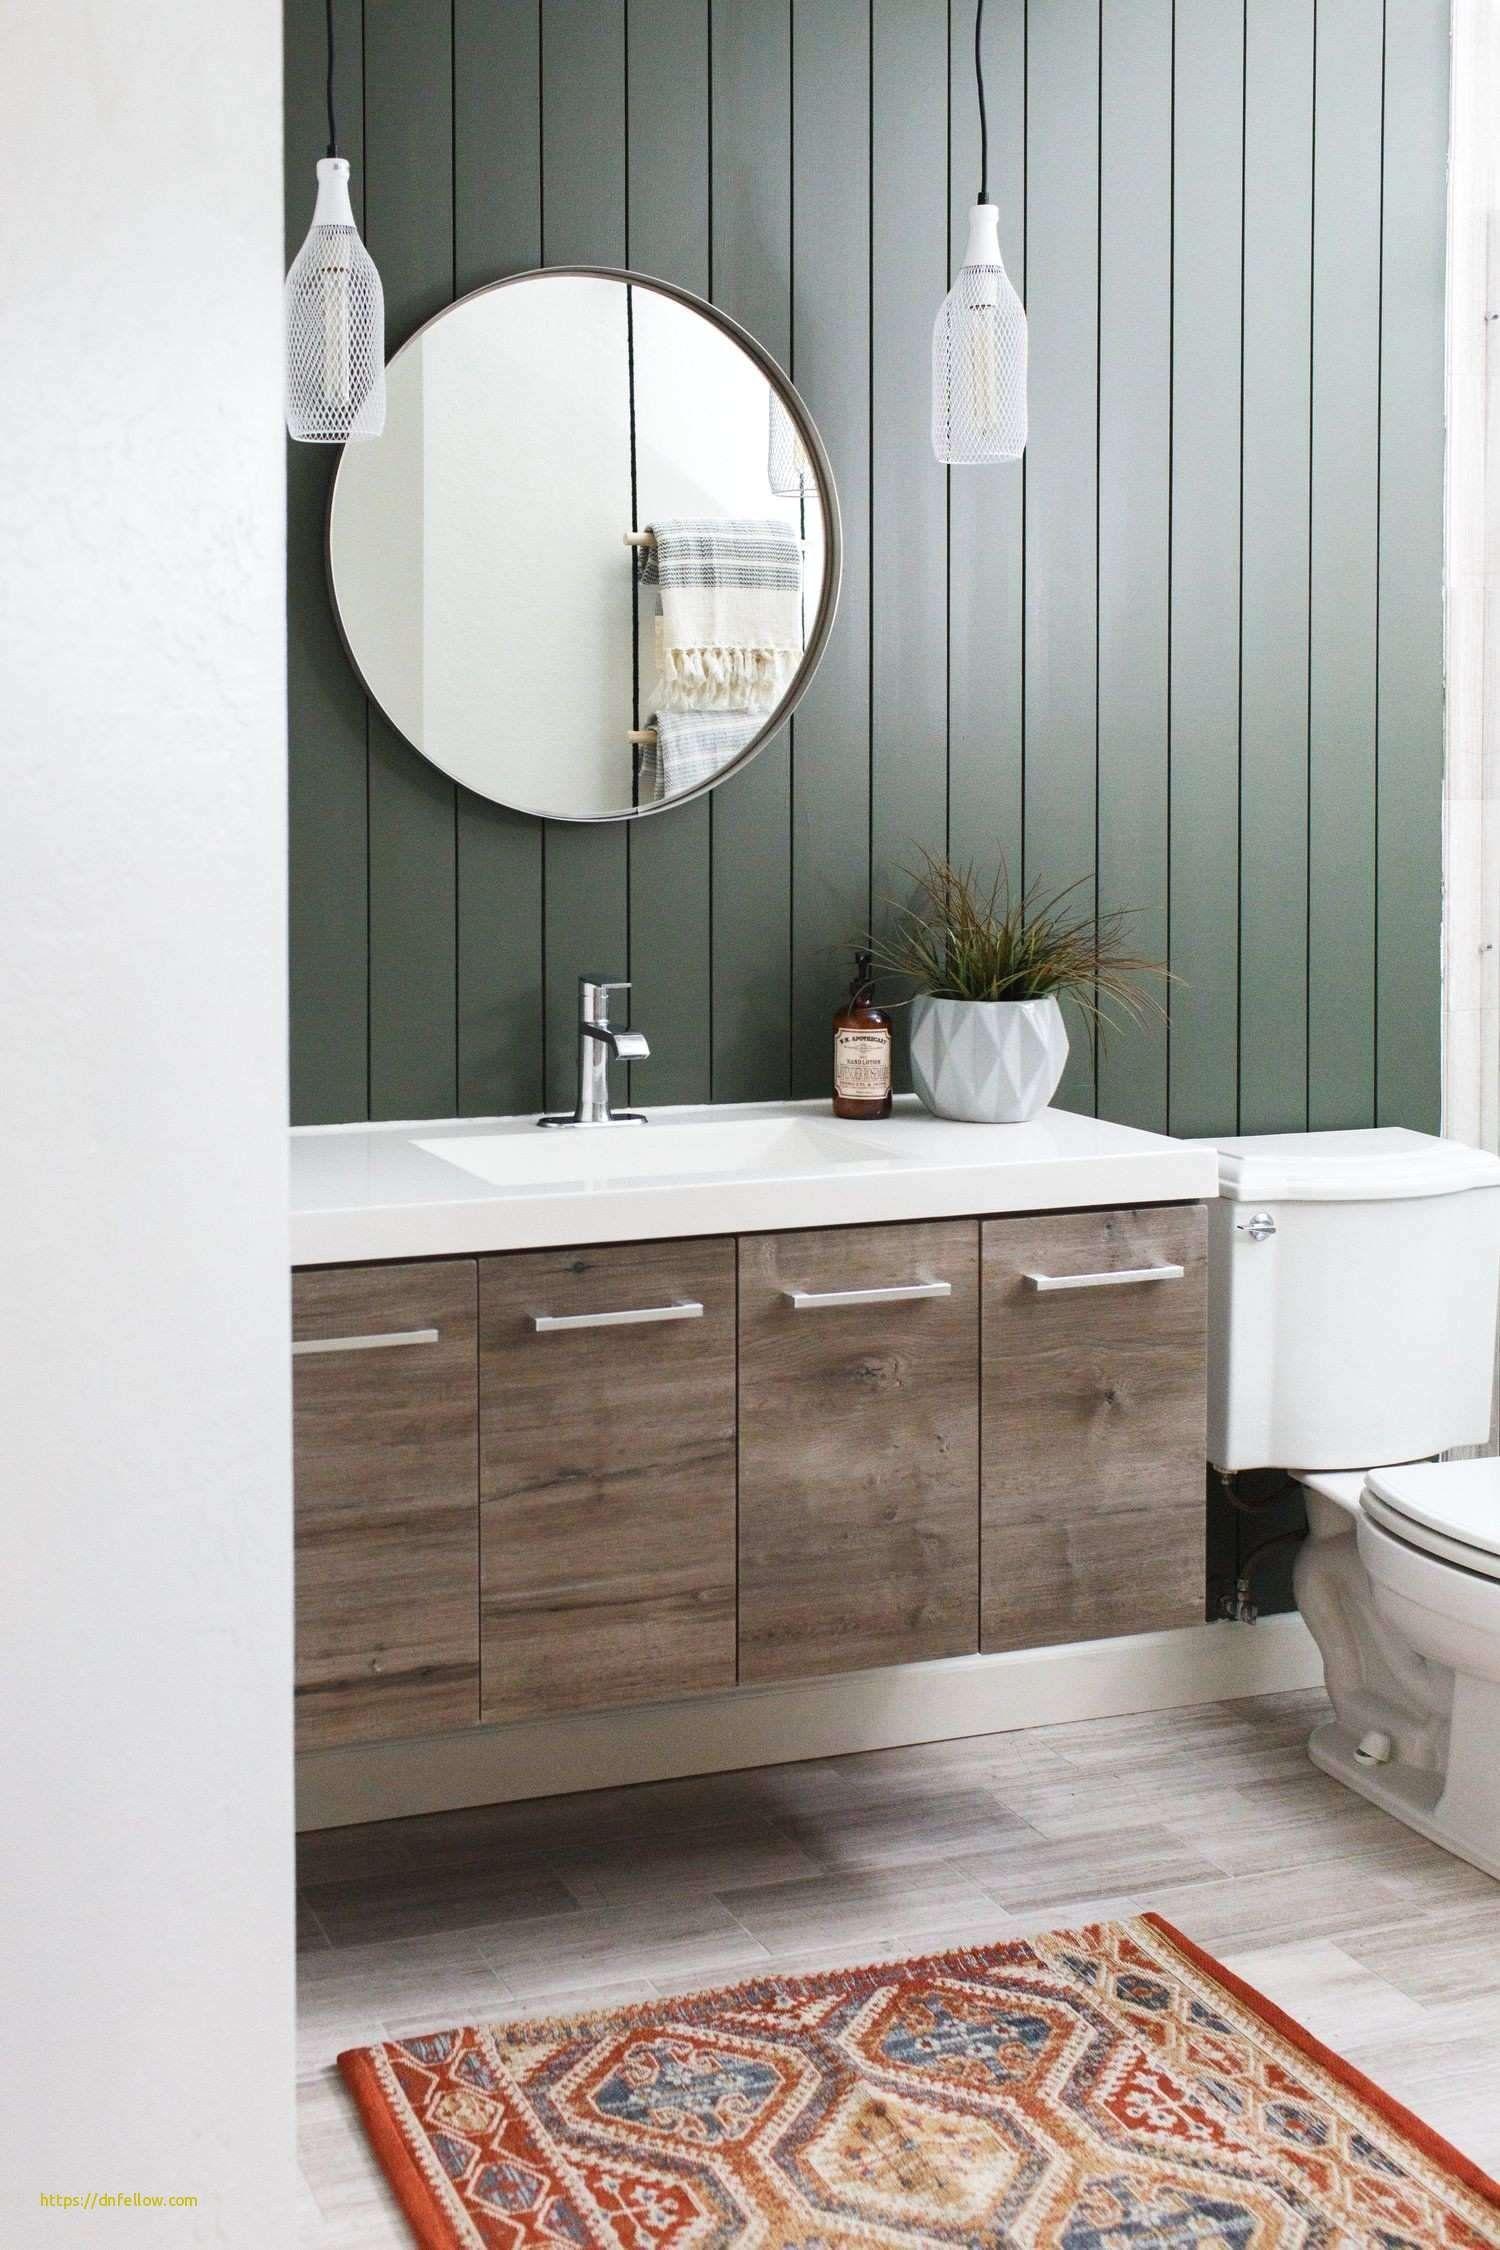 Inspirational Bathroom Design Denver Inspirational Bathroom Design Denver    Allowed To Be Able To My Own